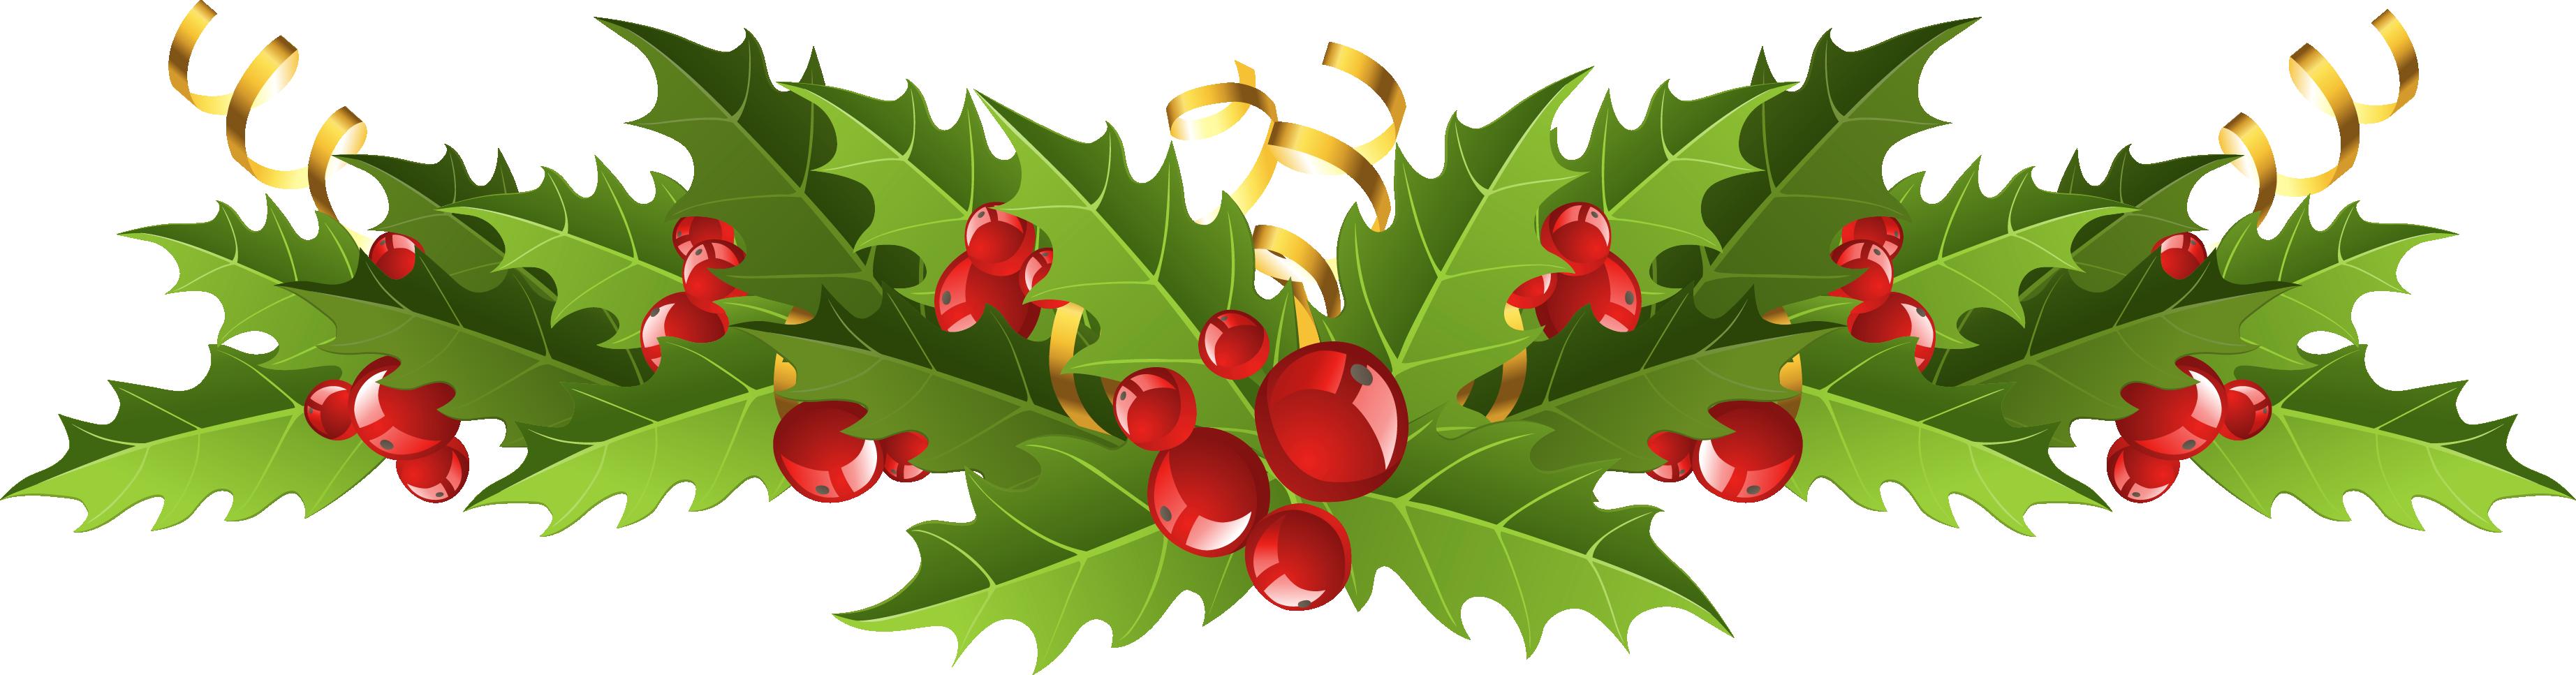 Christmas mistletoe clipart banner library download 28+ Collection of Mistletoe Clipart Border | High quality, free ... banner library download